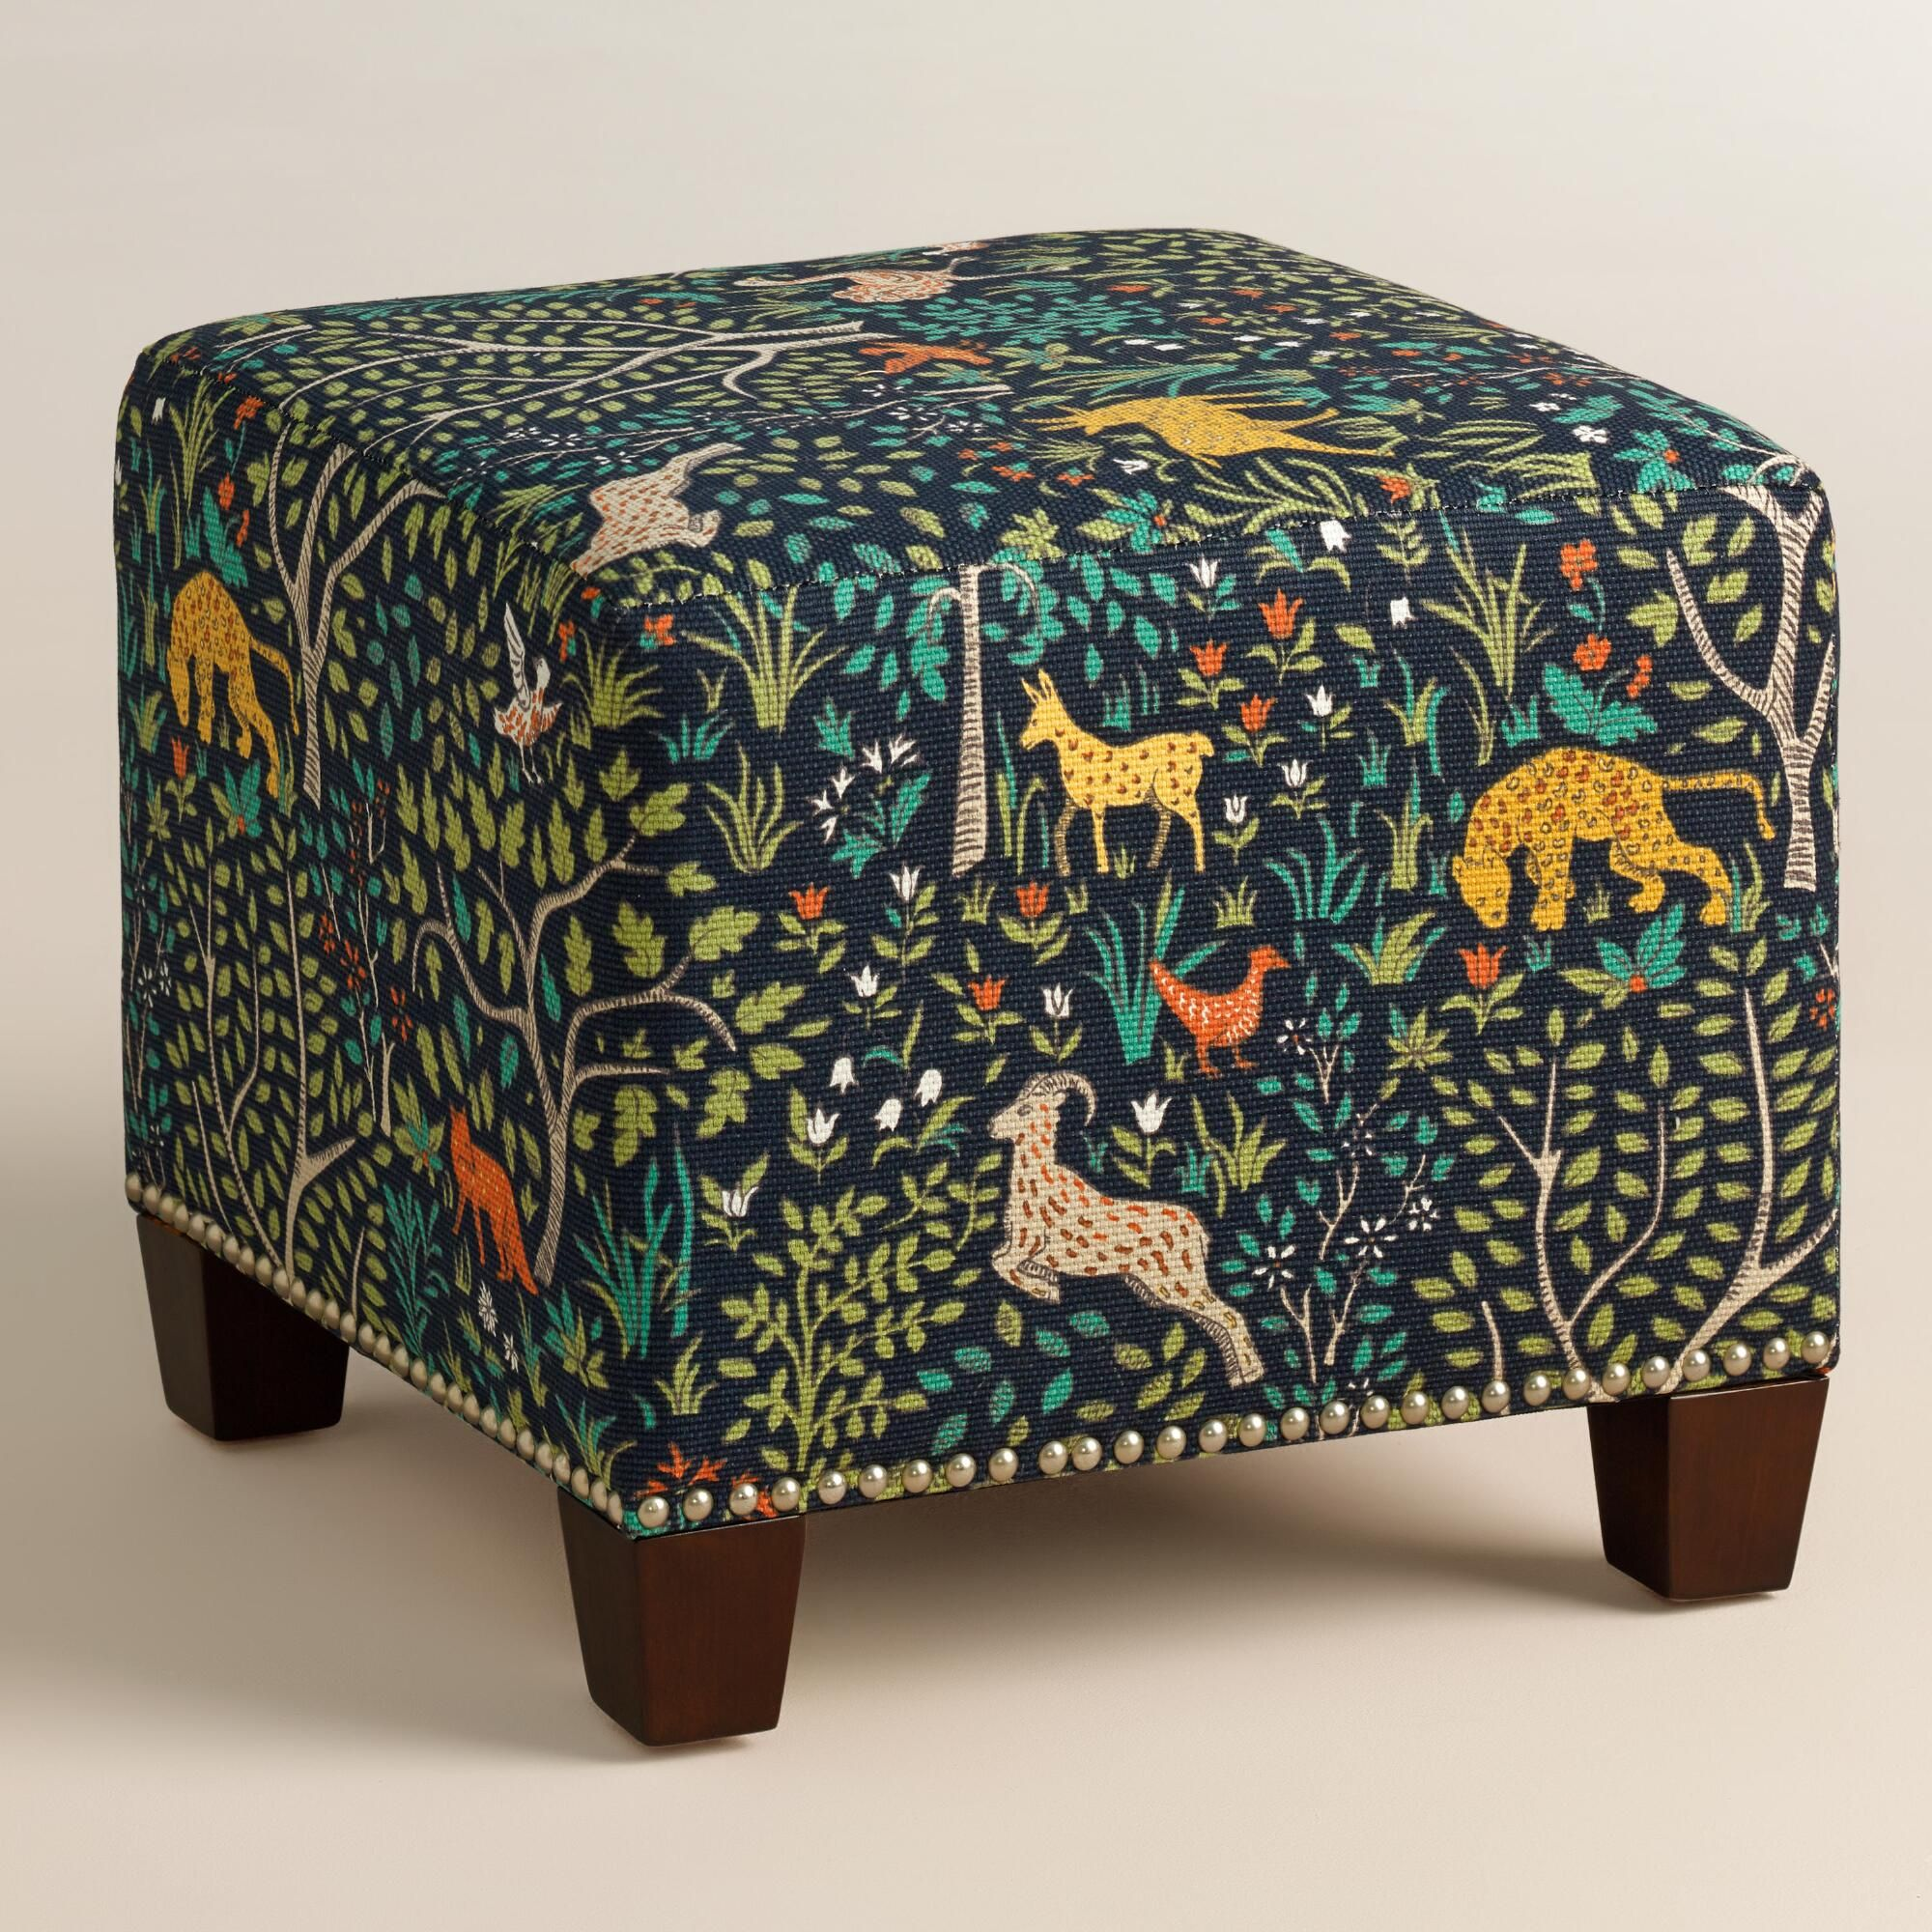 Folkland McKenzie Upholstered Ottoman | Folk art, Ottomans and Fabrics